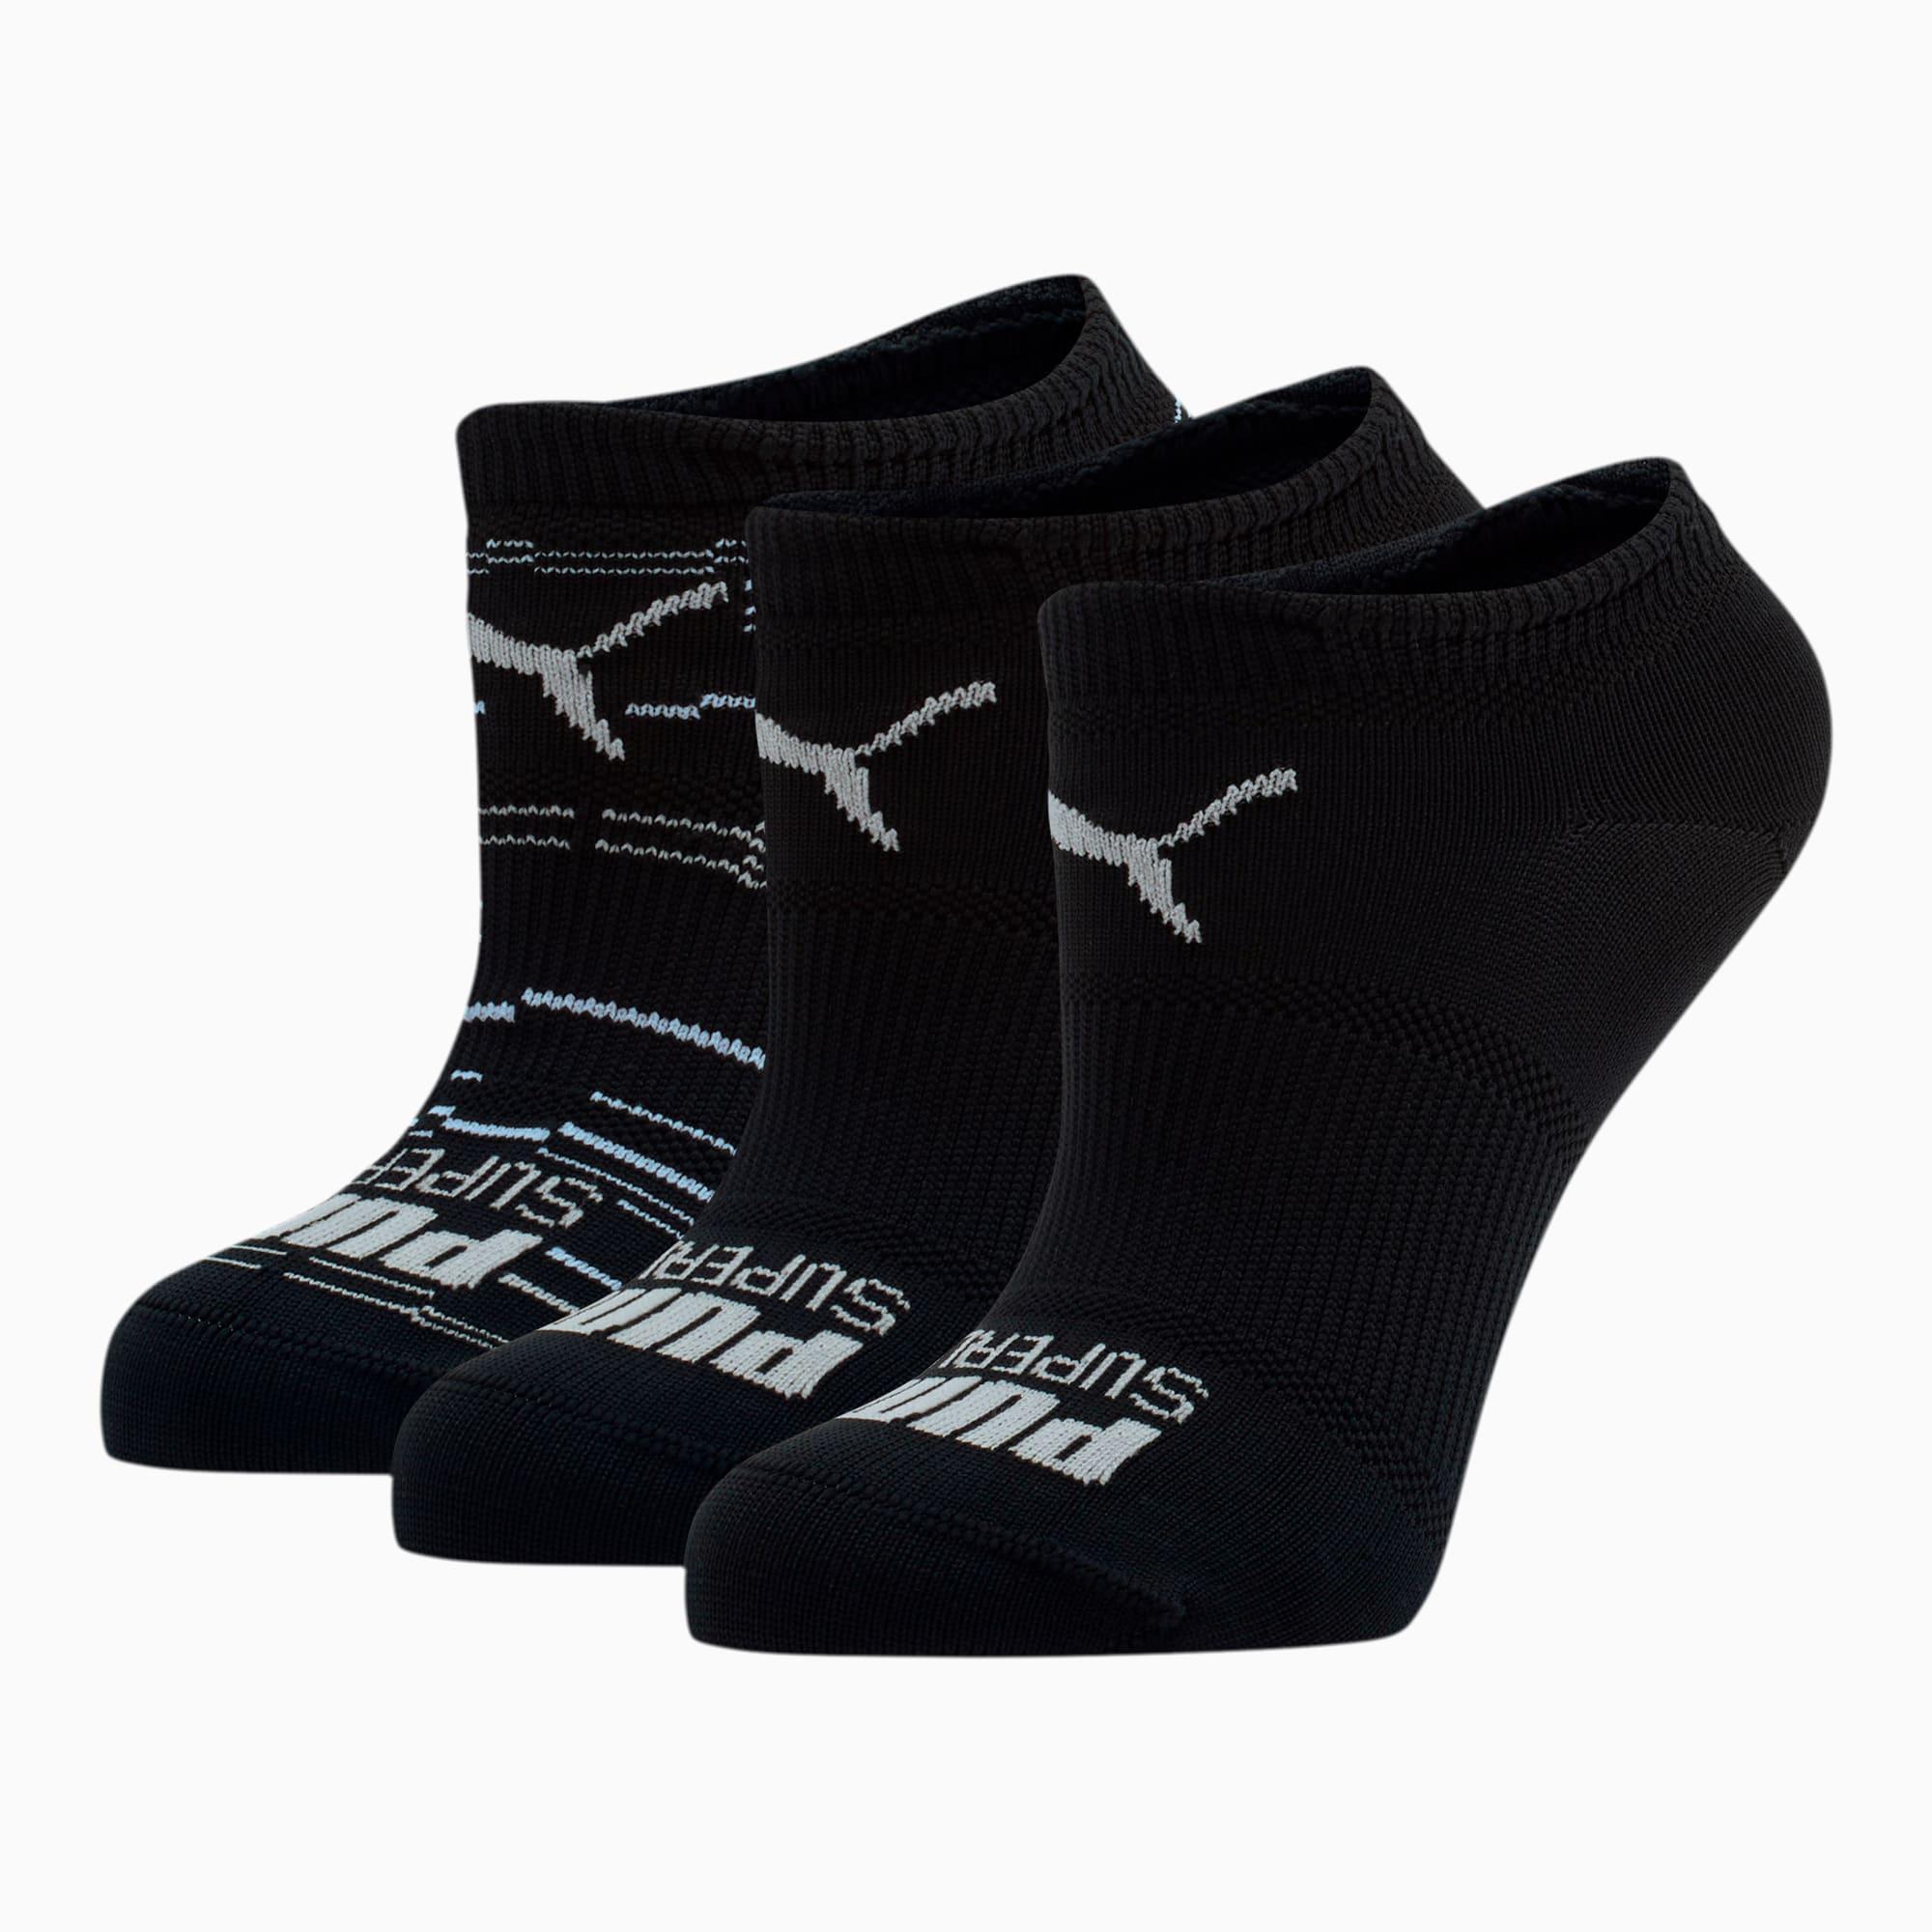 New Black Nylon Sophia Lady Trouser Anklet Socks Size 9-11